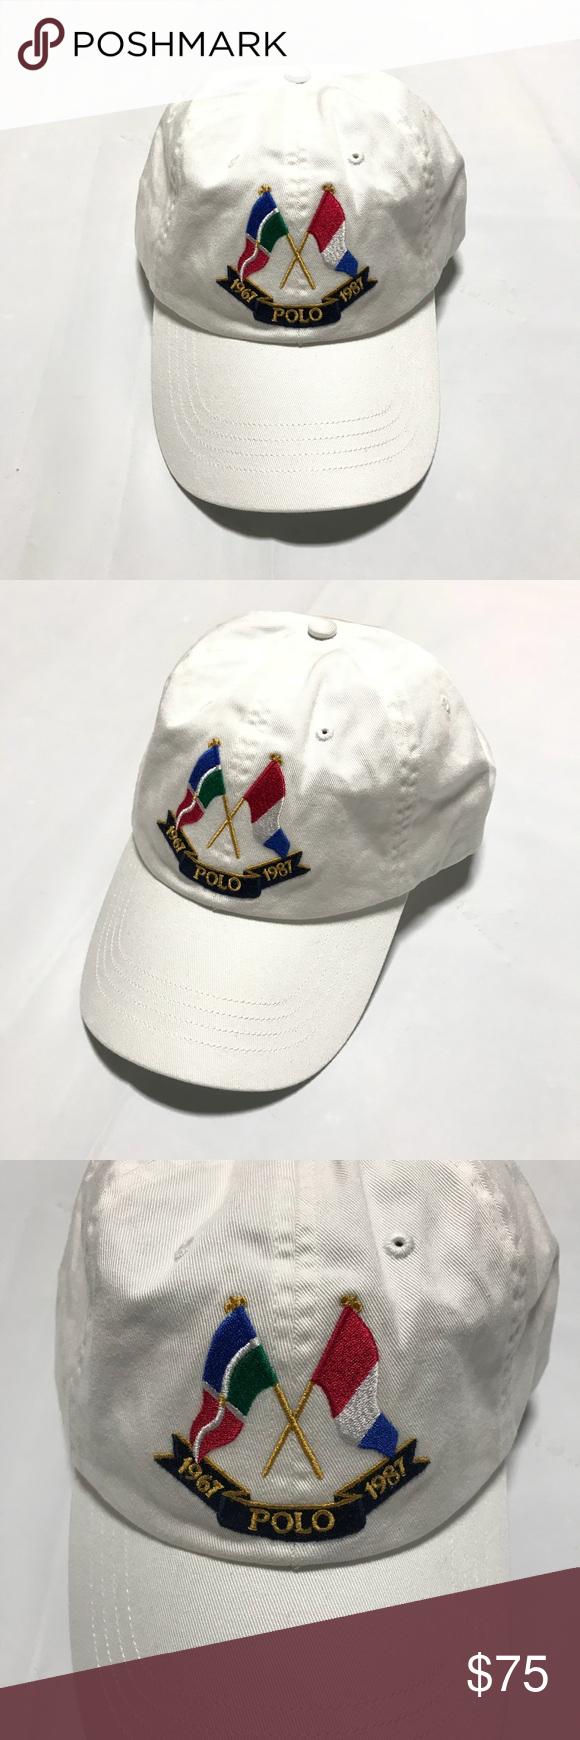 NWT Polo Ralph Lauren Anniversary Cross Flags Baseball Hat in White